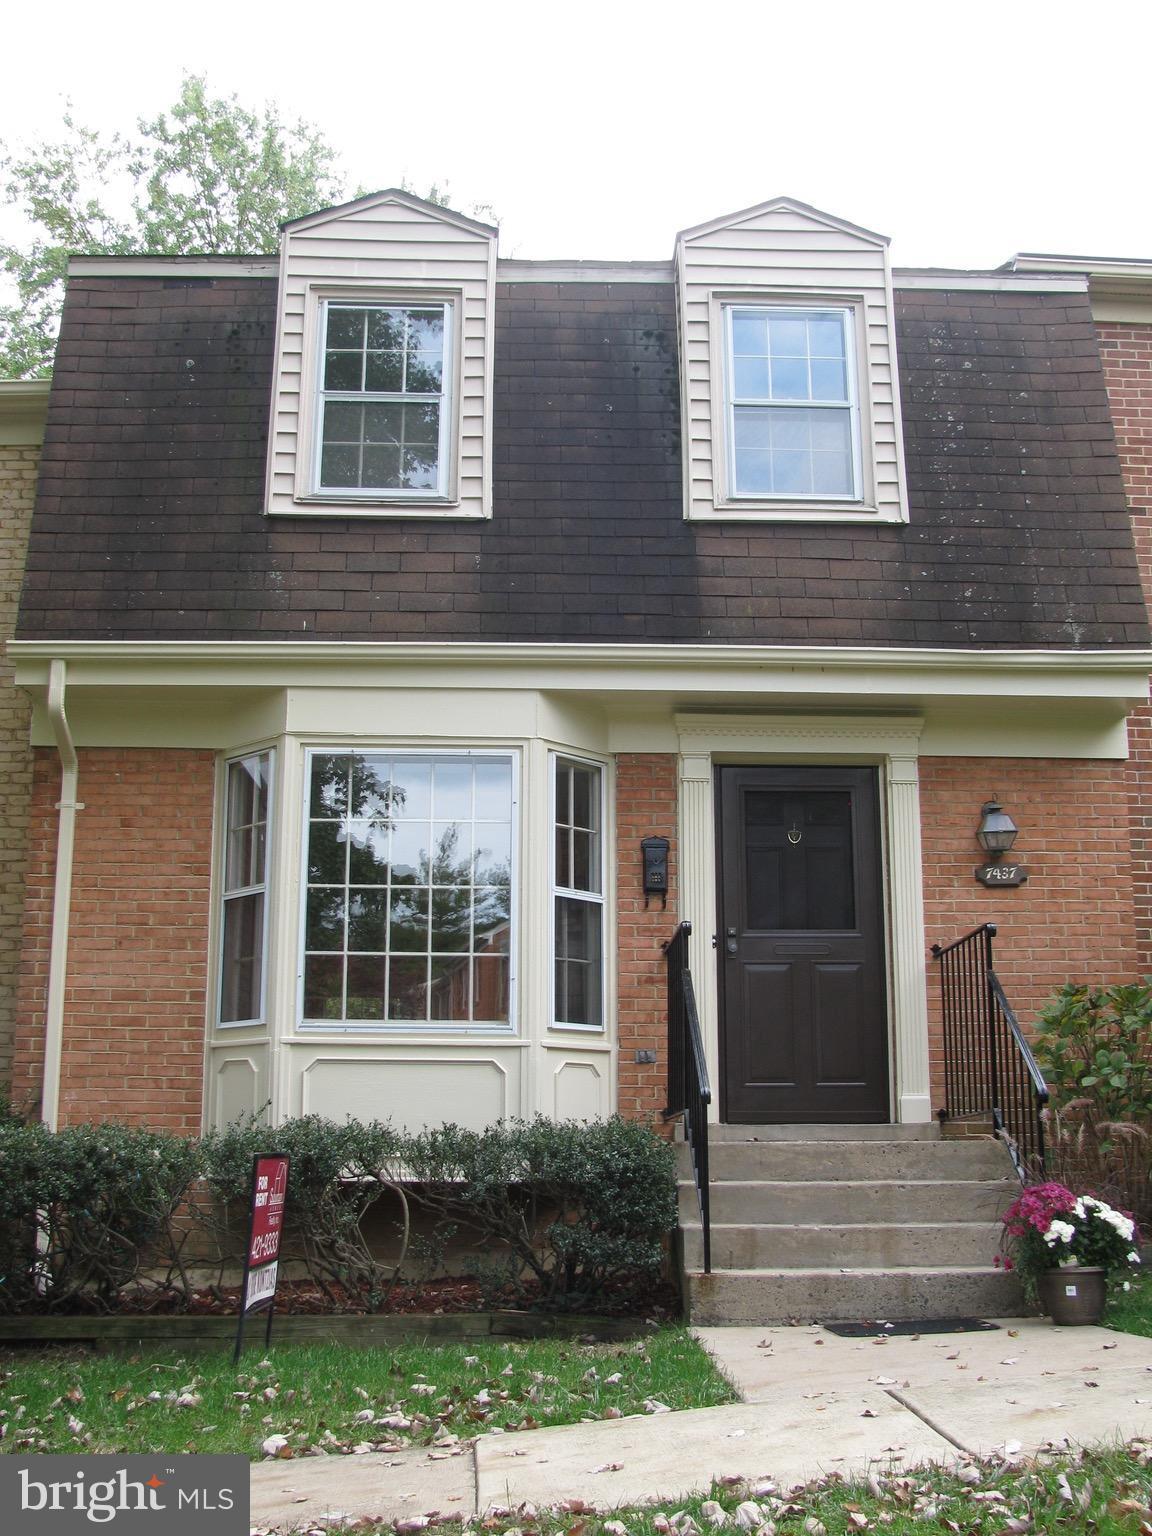 Residential Lease $2895 3 bd 3 ba 4 ba 1 bpt 1771 sqft 7437